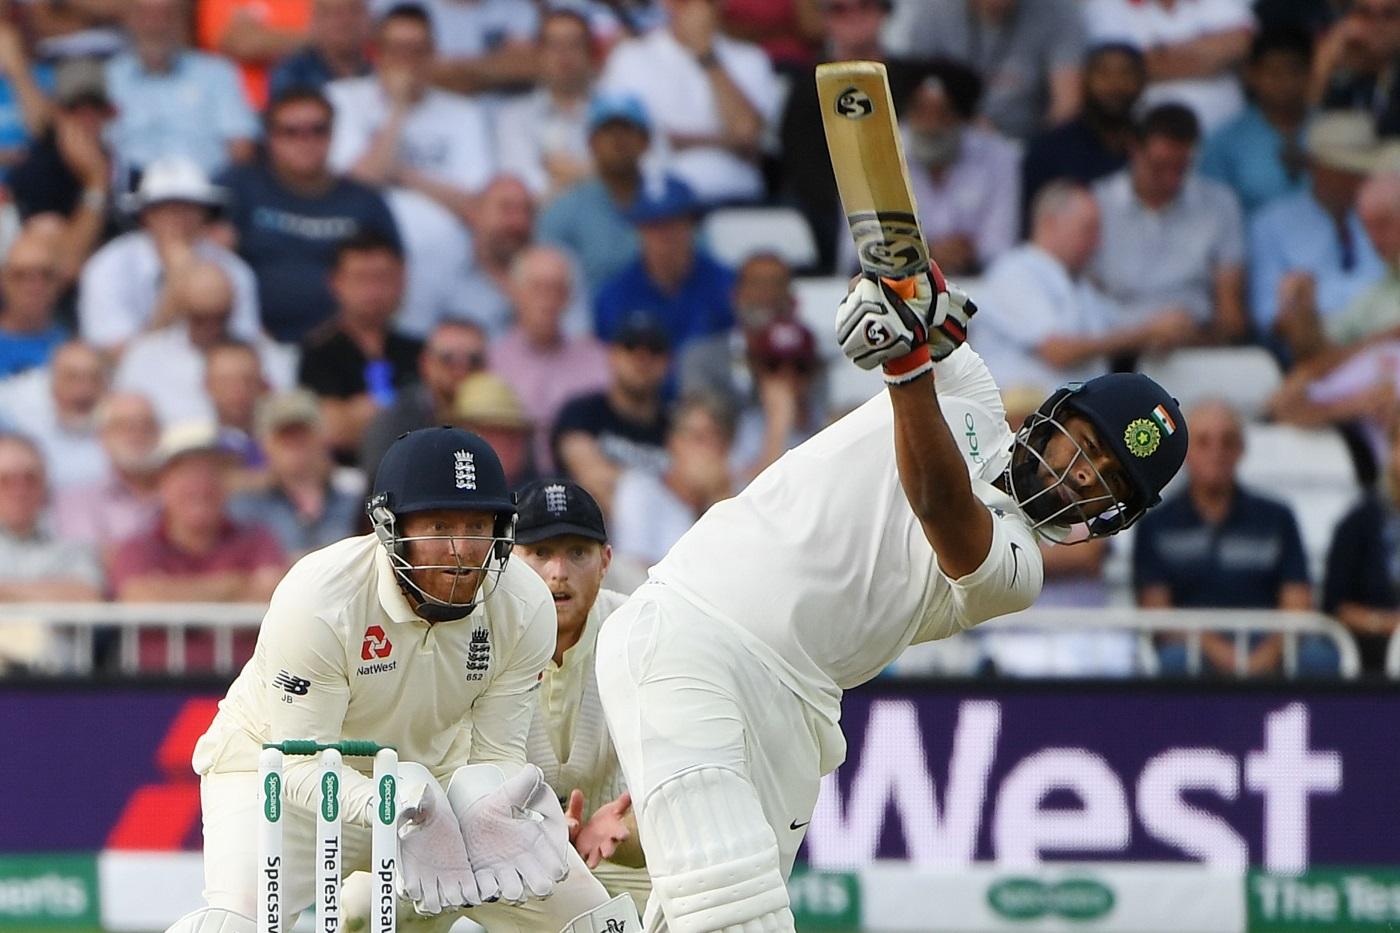 It Feels Good When Your Captain Backs You: Rishabh Pant